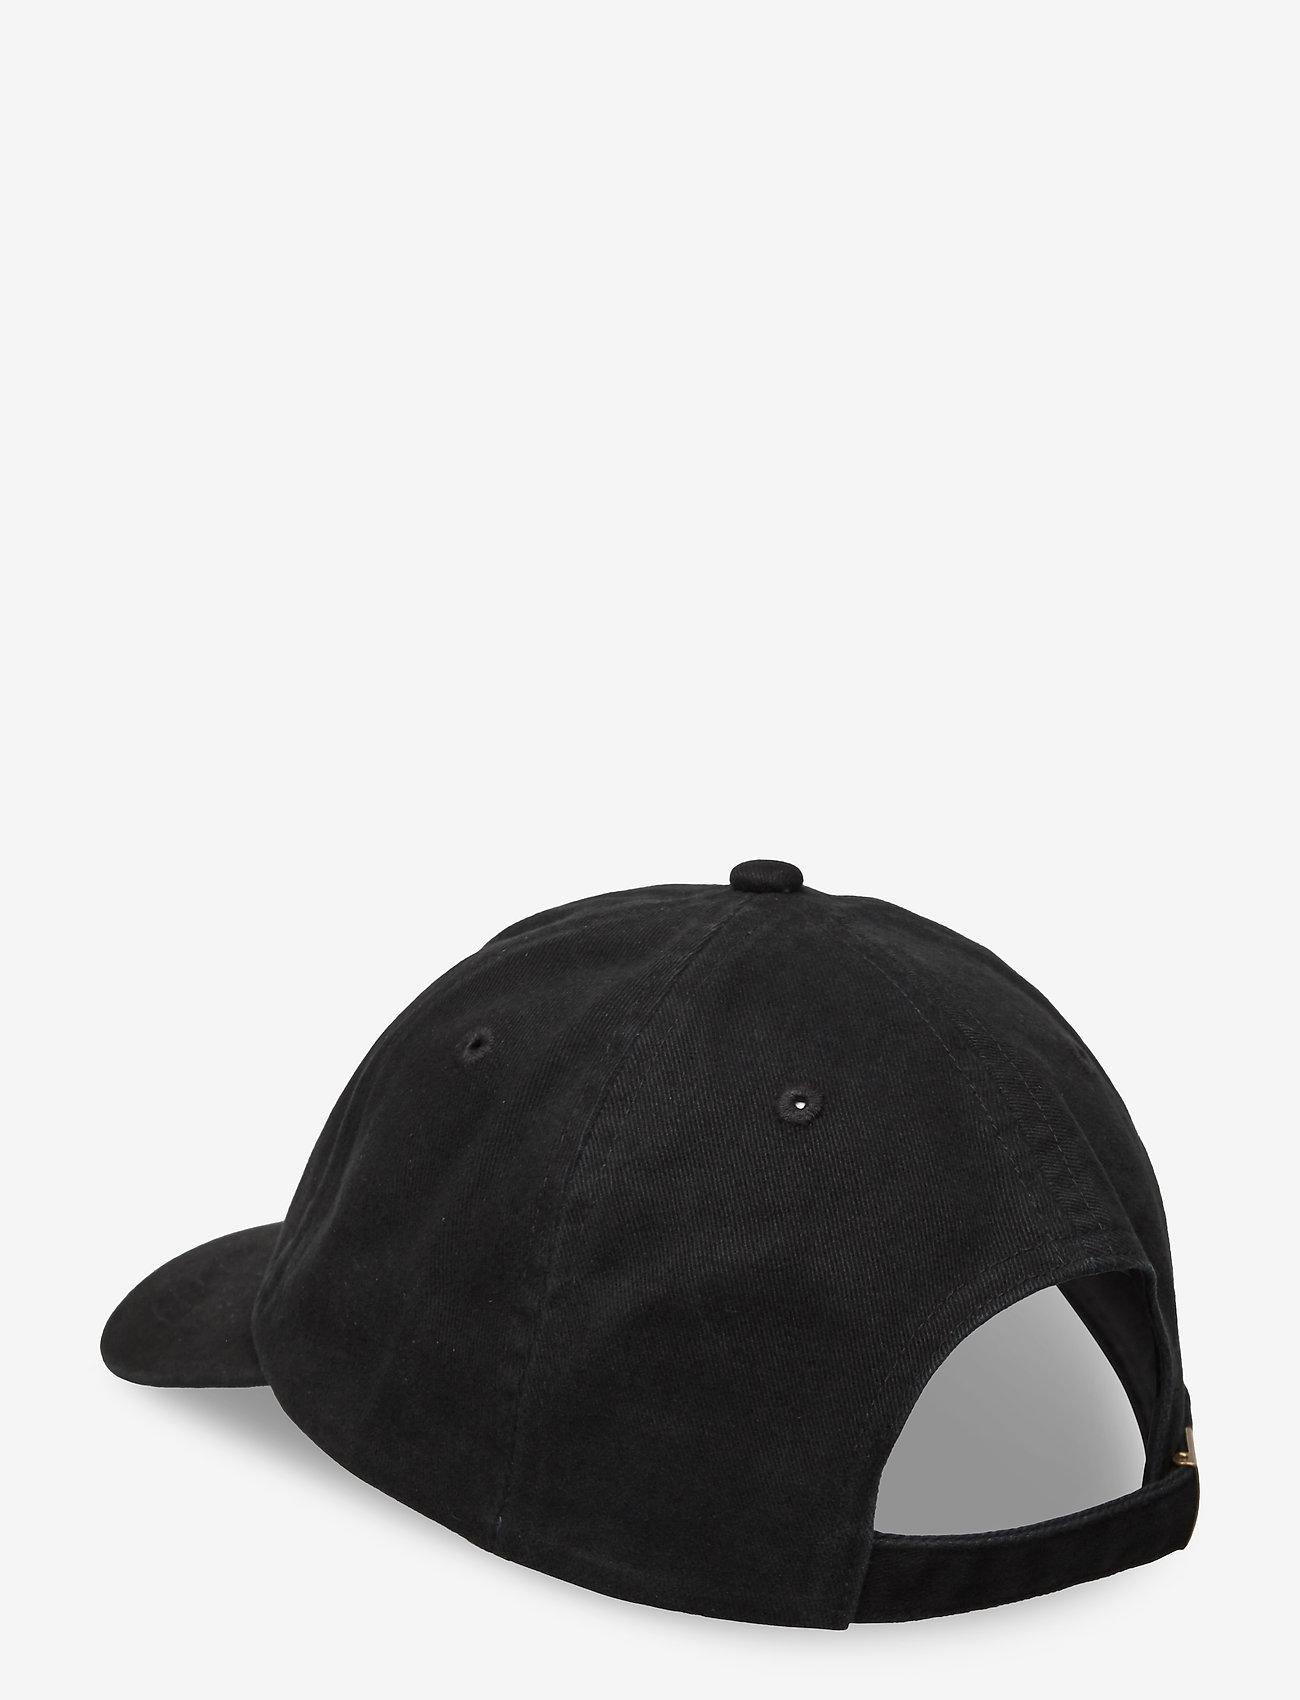 HALO - HALO CAP - caps - black - 1